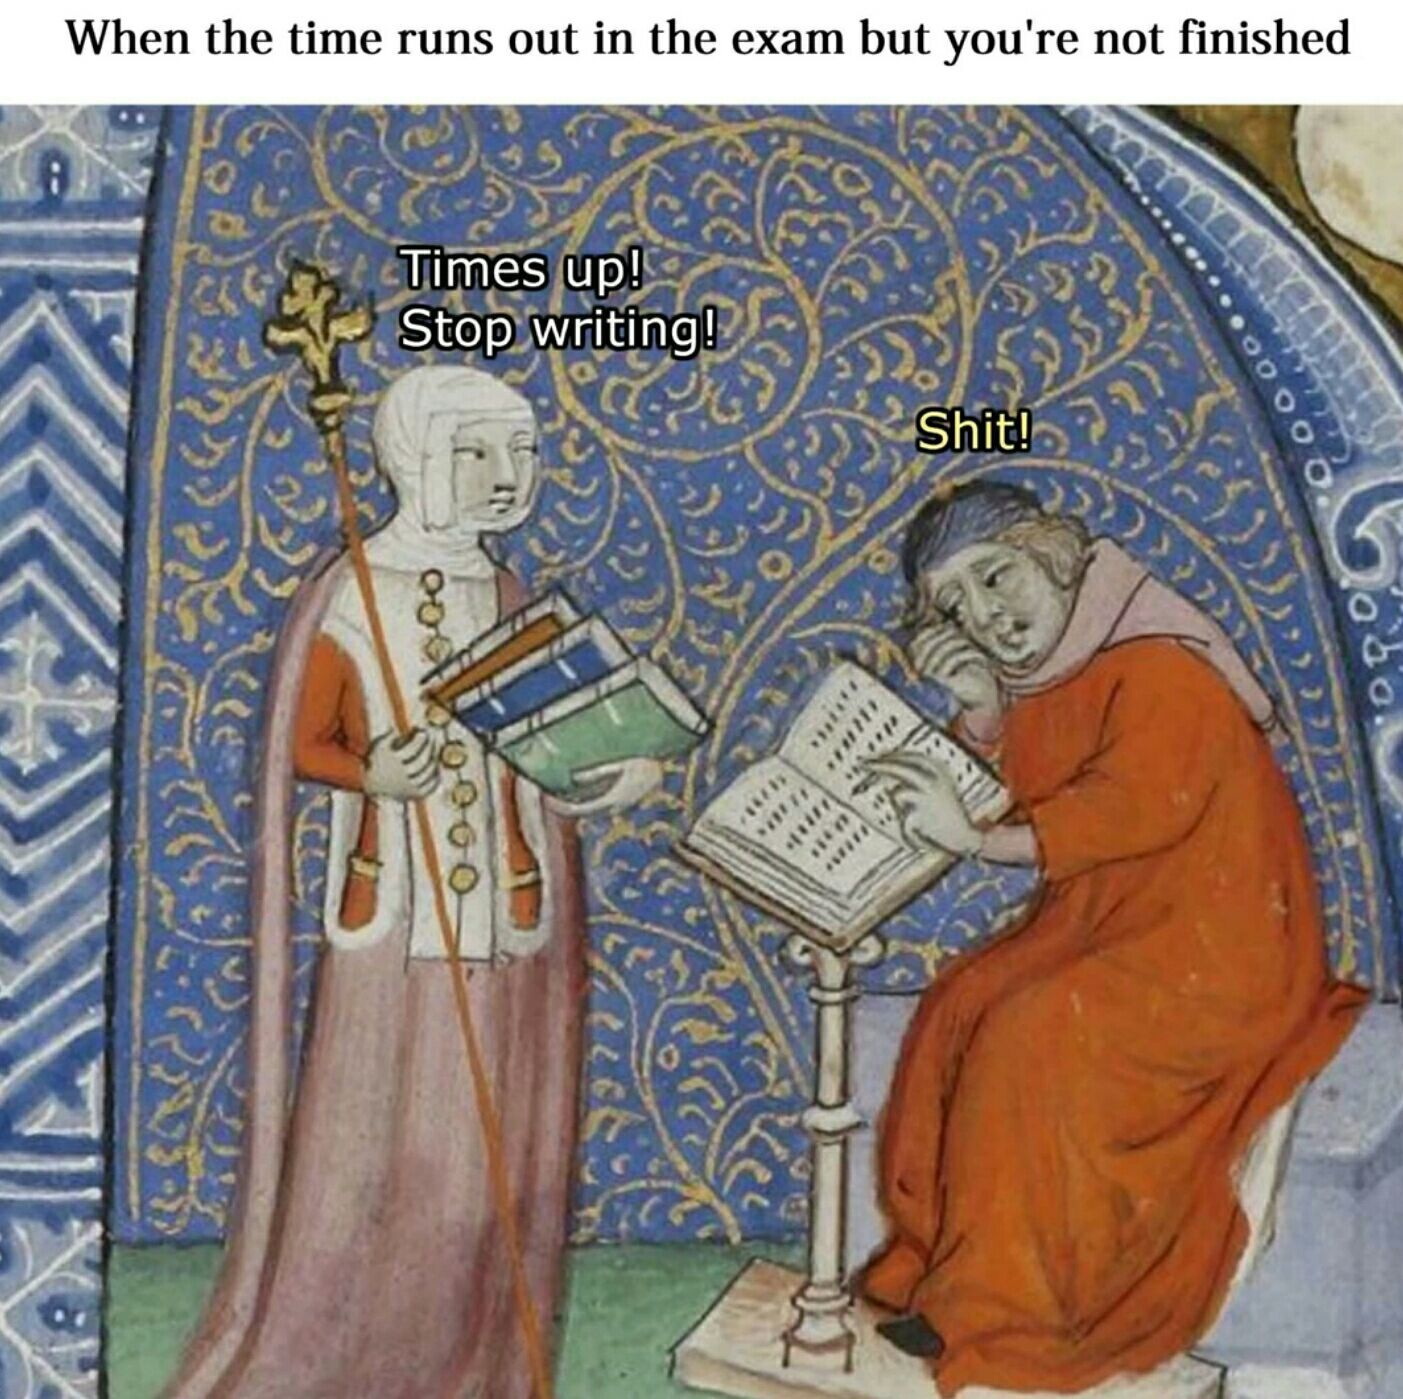 Every exam - meme